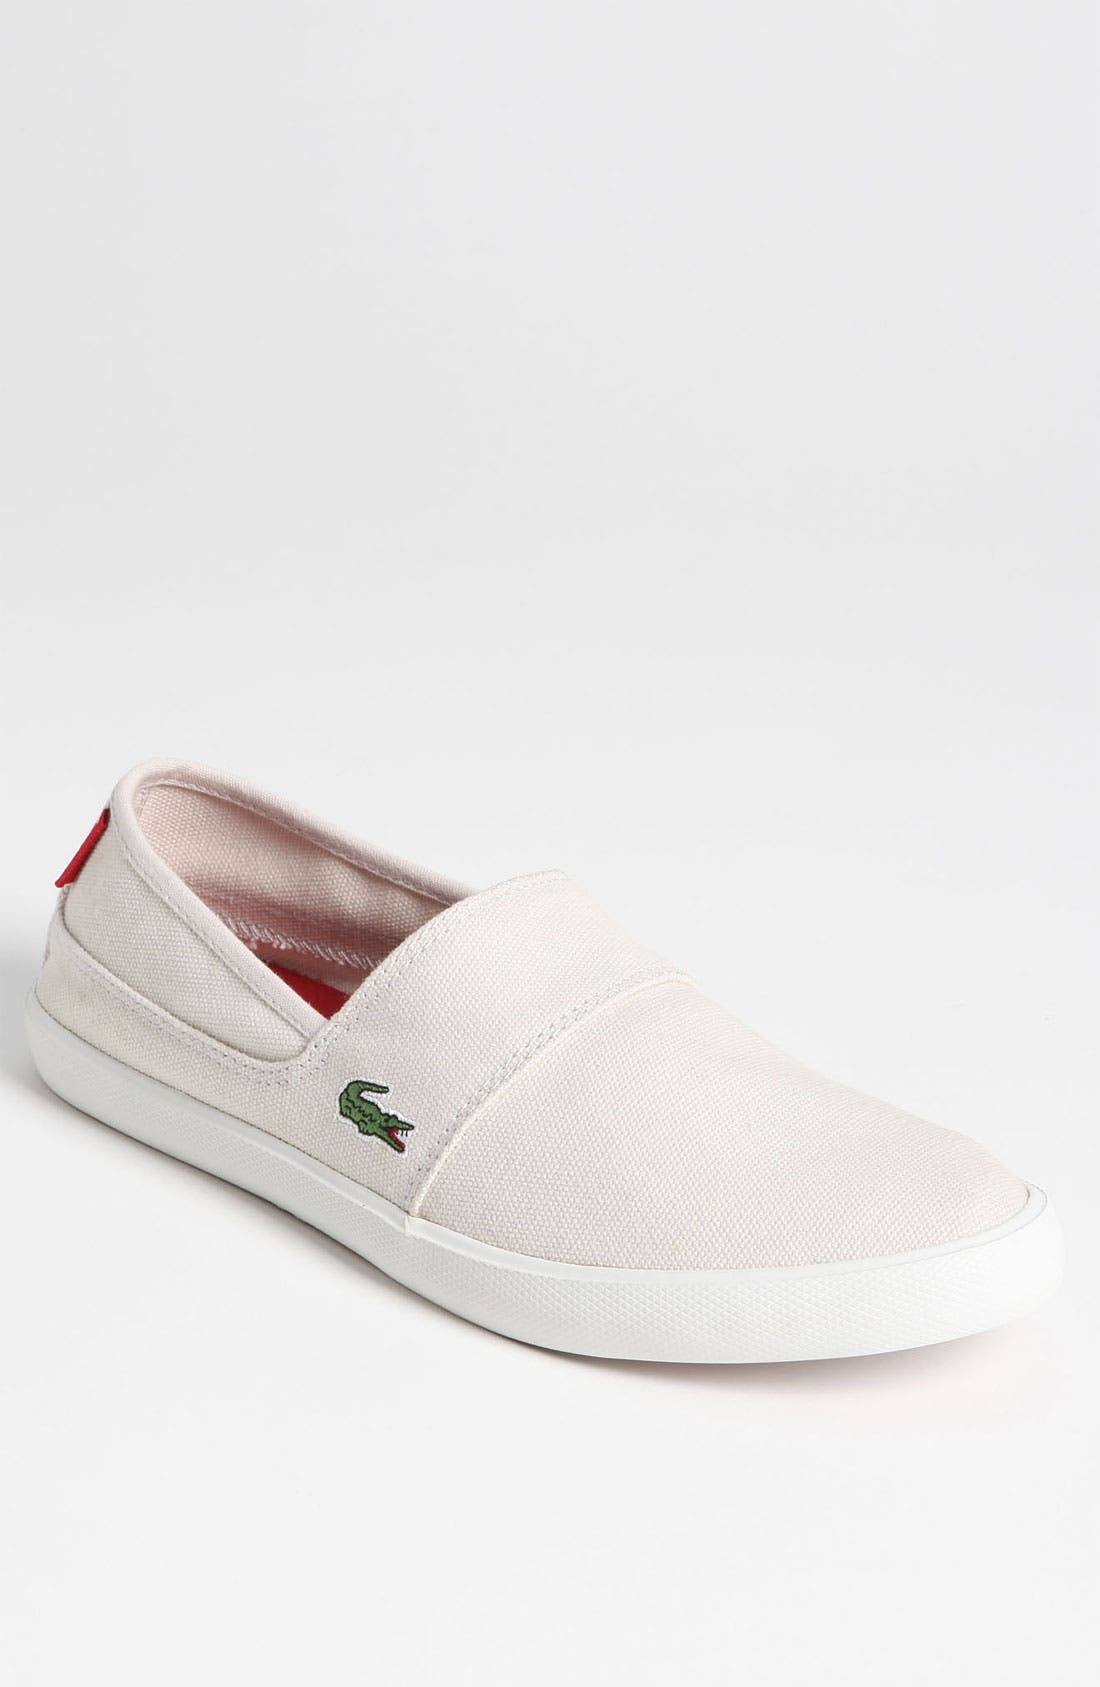 Alternate Image 1 Selected - Lacoste 'Clemente CI' Slip-On Sneaker